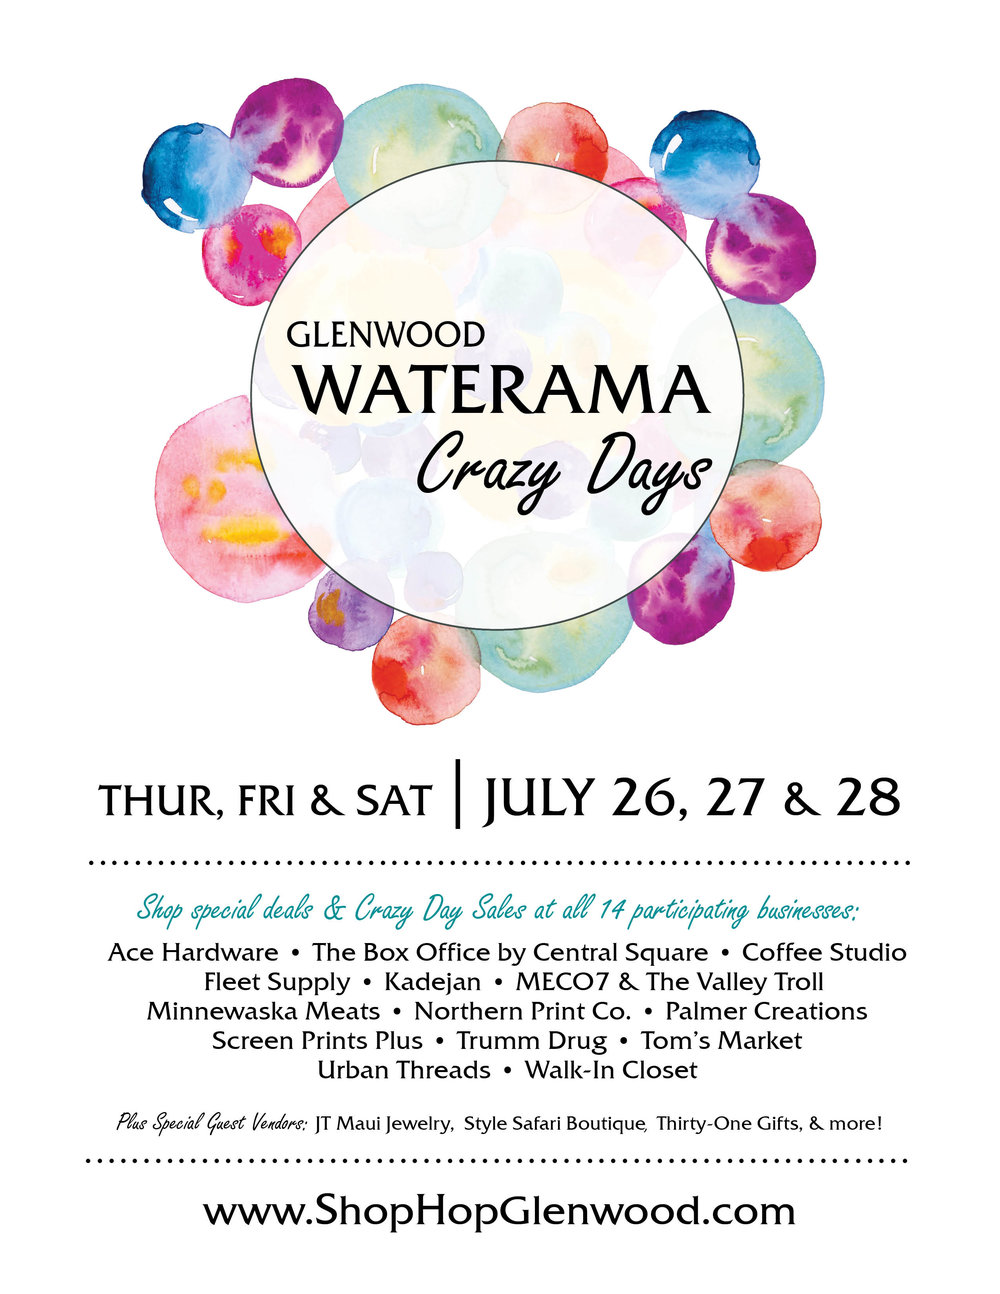 waterama-crazy-days-poster.jpg